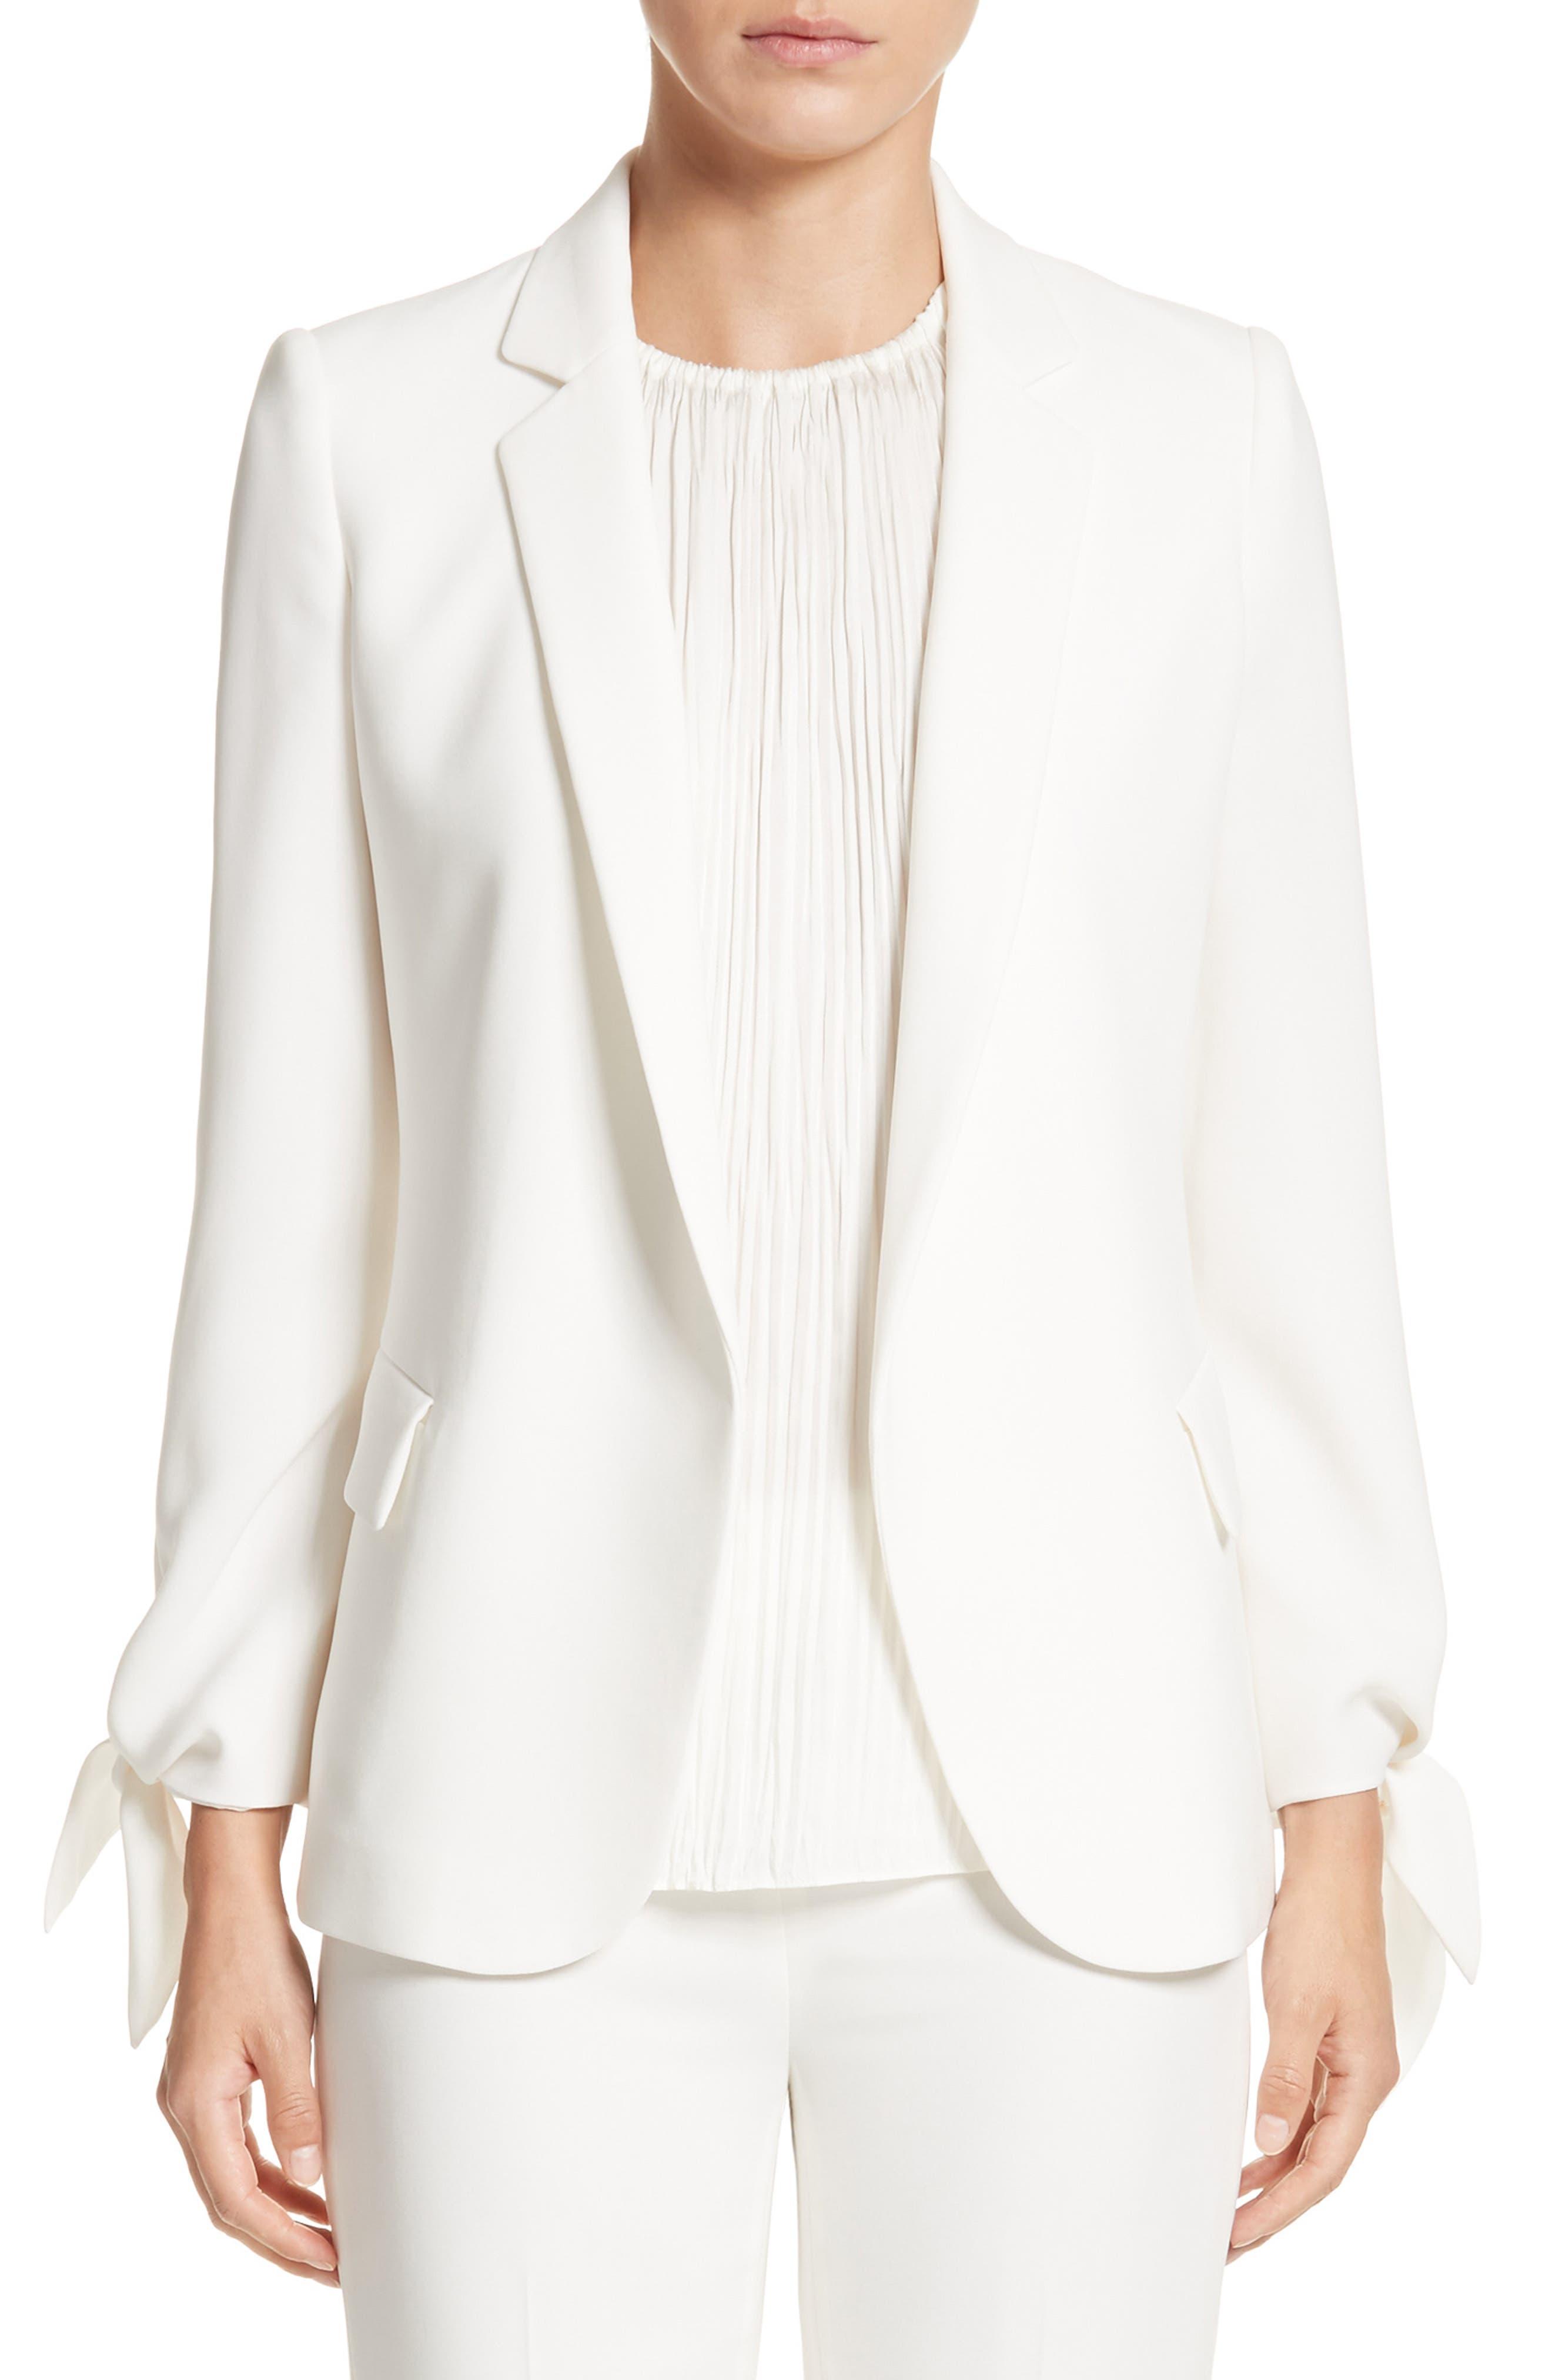 Bria Finesse Crepe Jacket,                         Main,                         color, 141